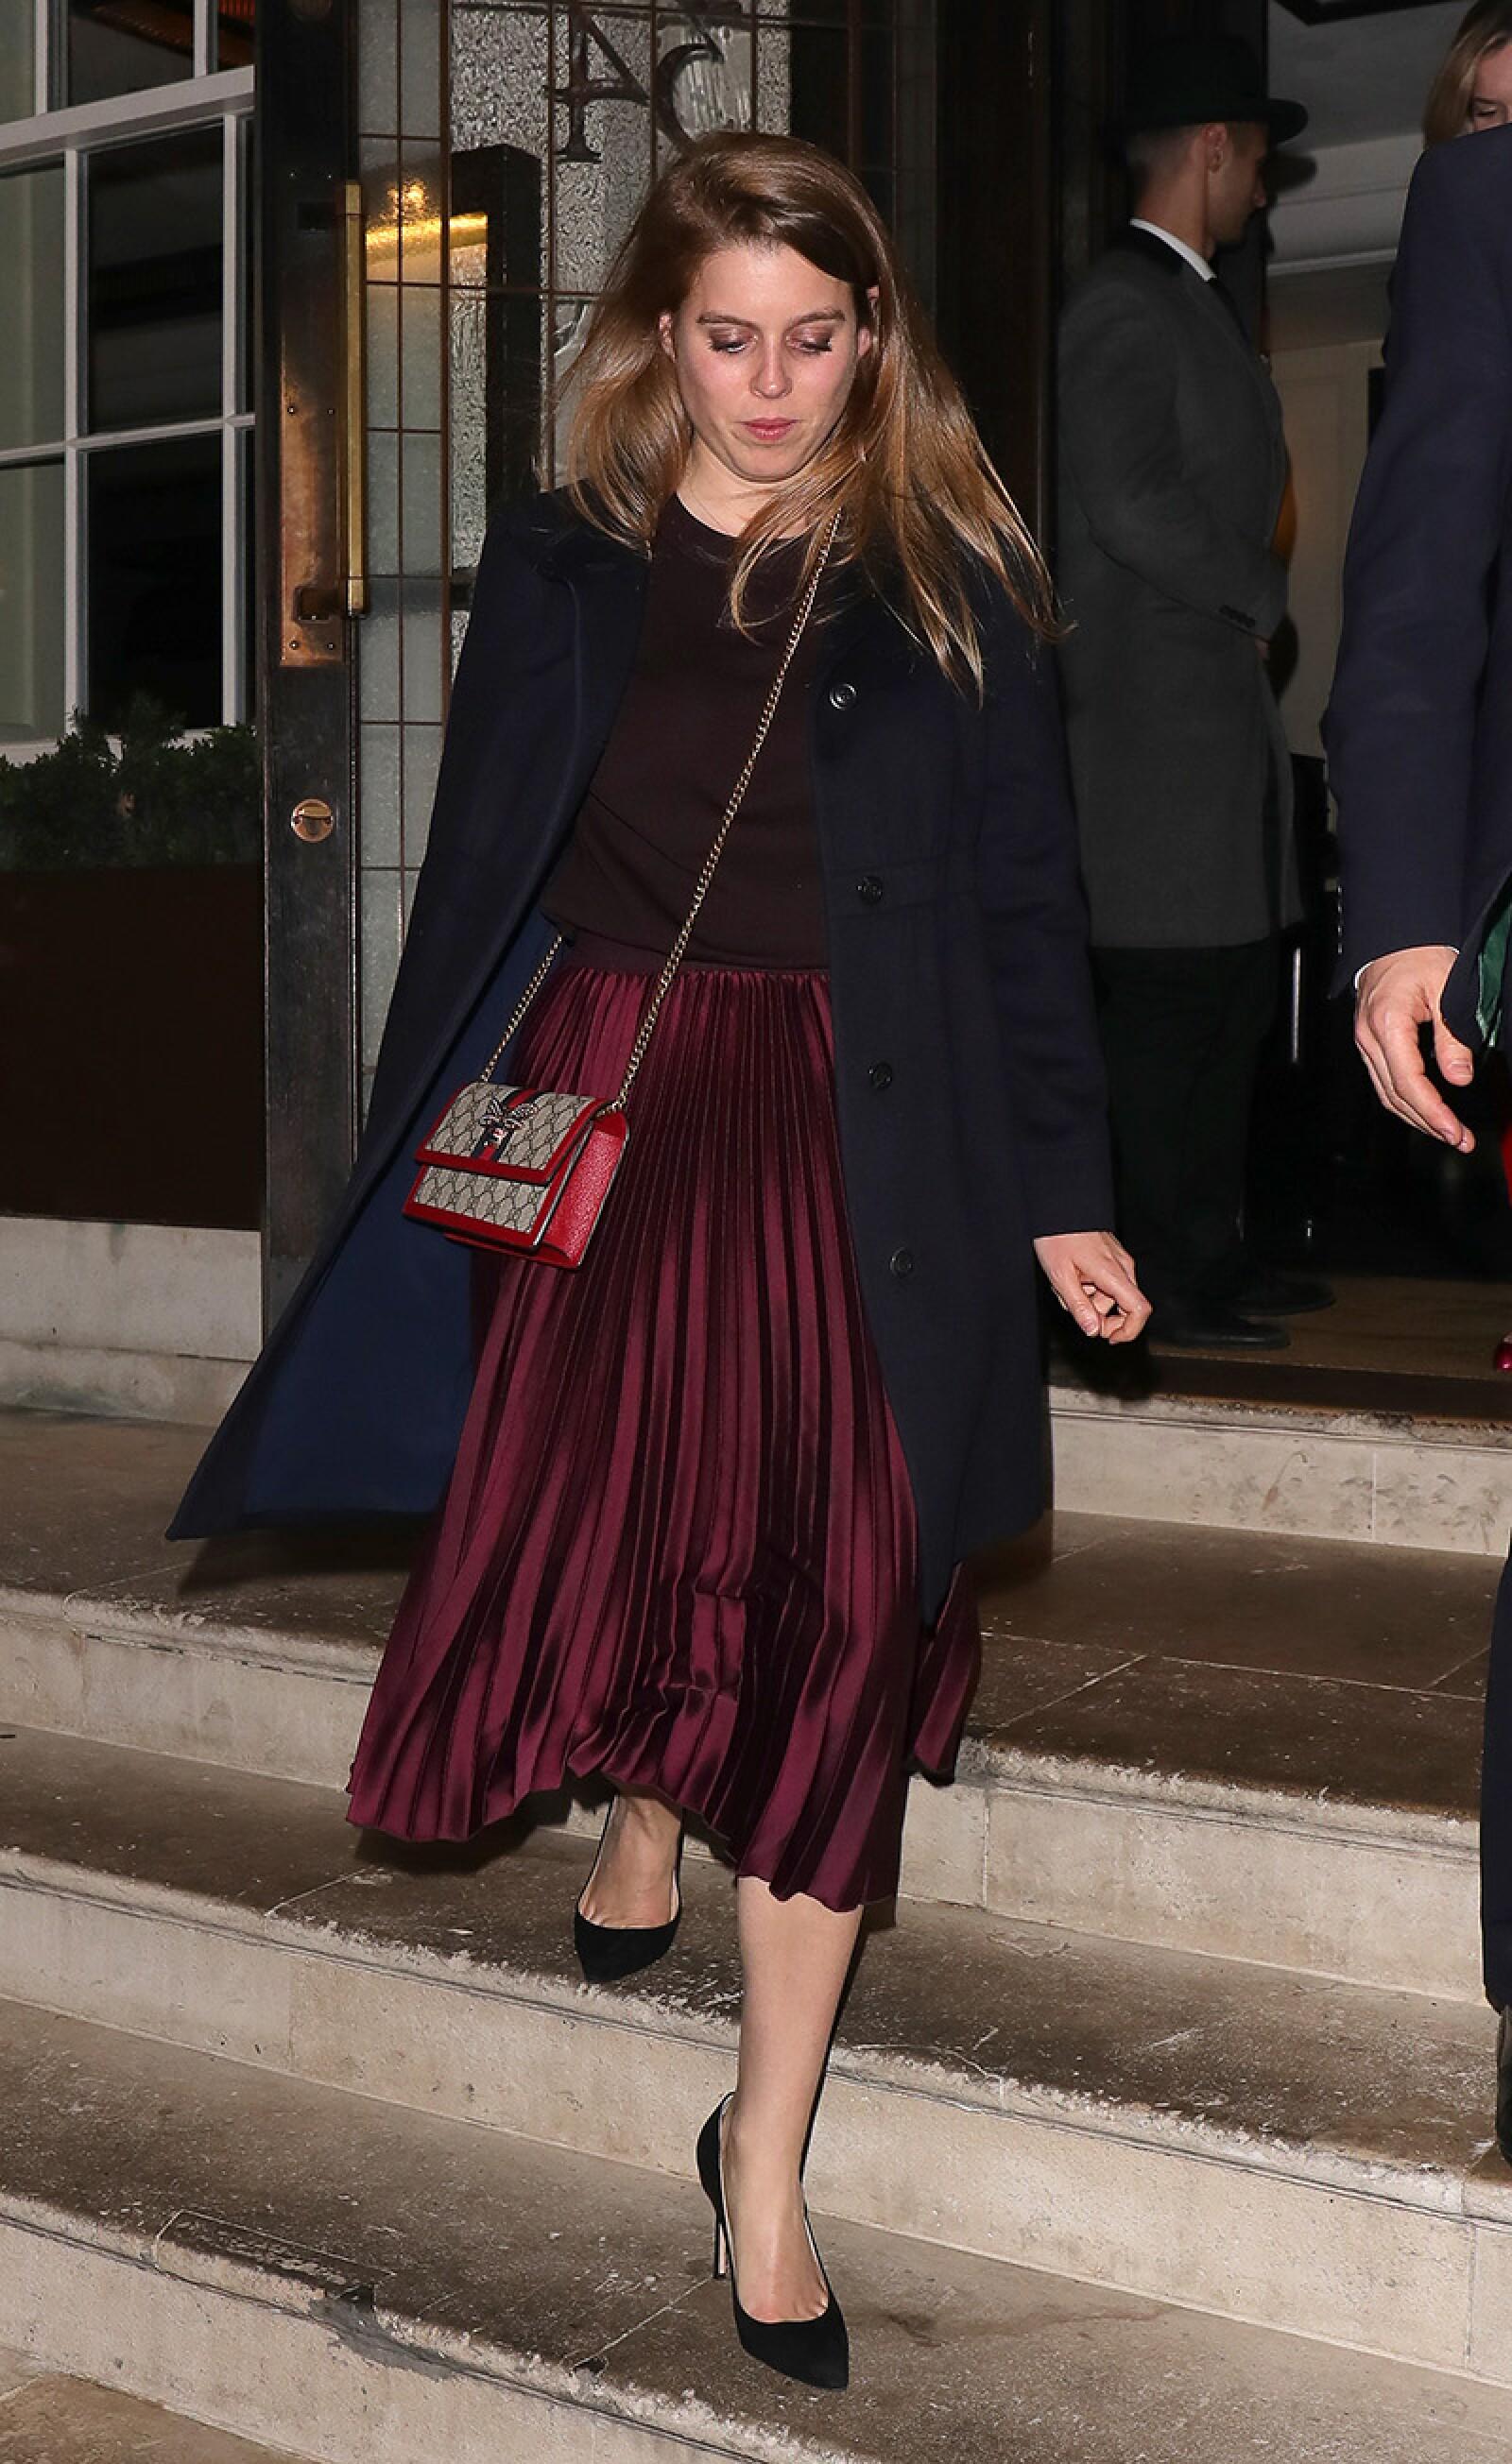 Celebrities leaving 34 restaurant, London, UK - 15 Apr 2019